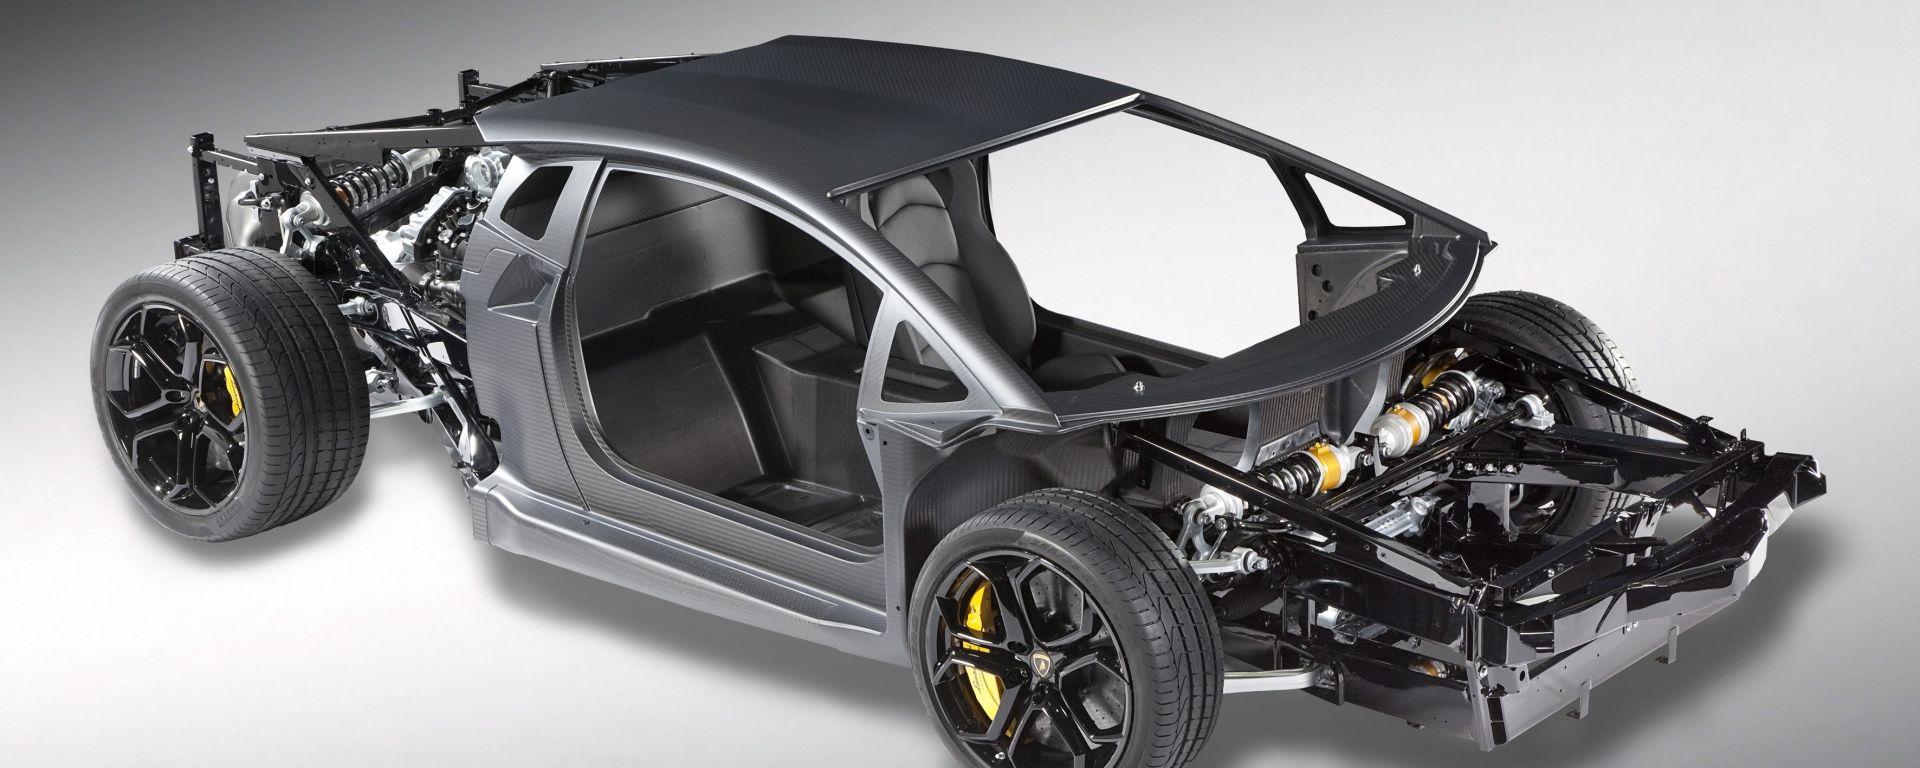 Lamborghini V12: svelato il telaio monoscocca